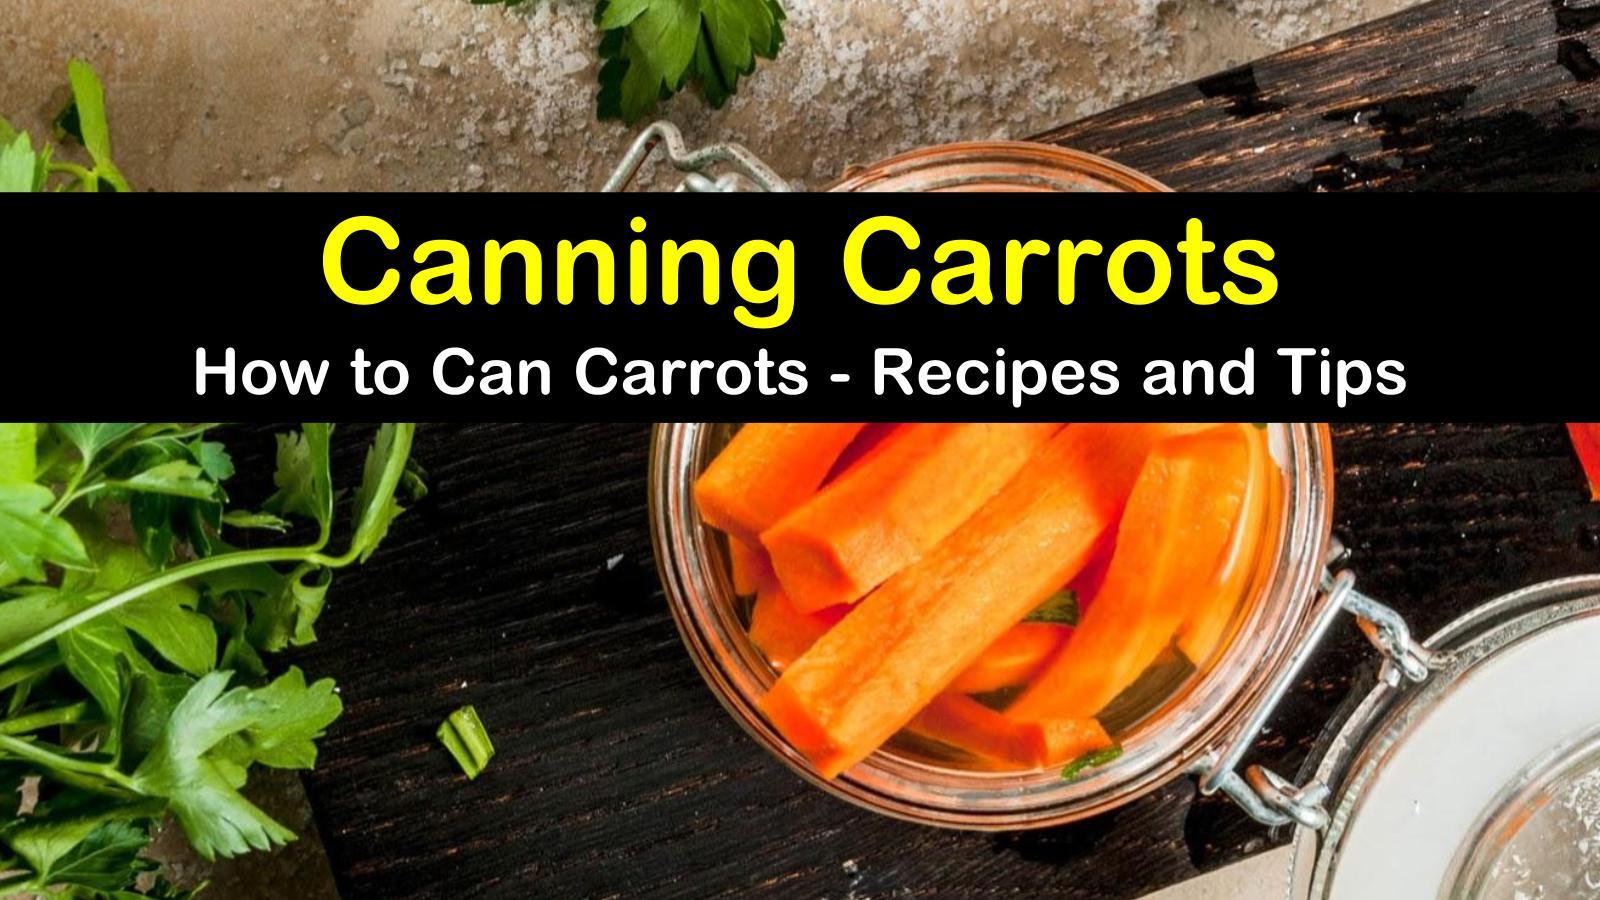 canning carrots titleimg1